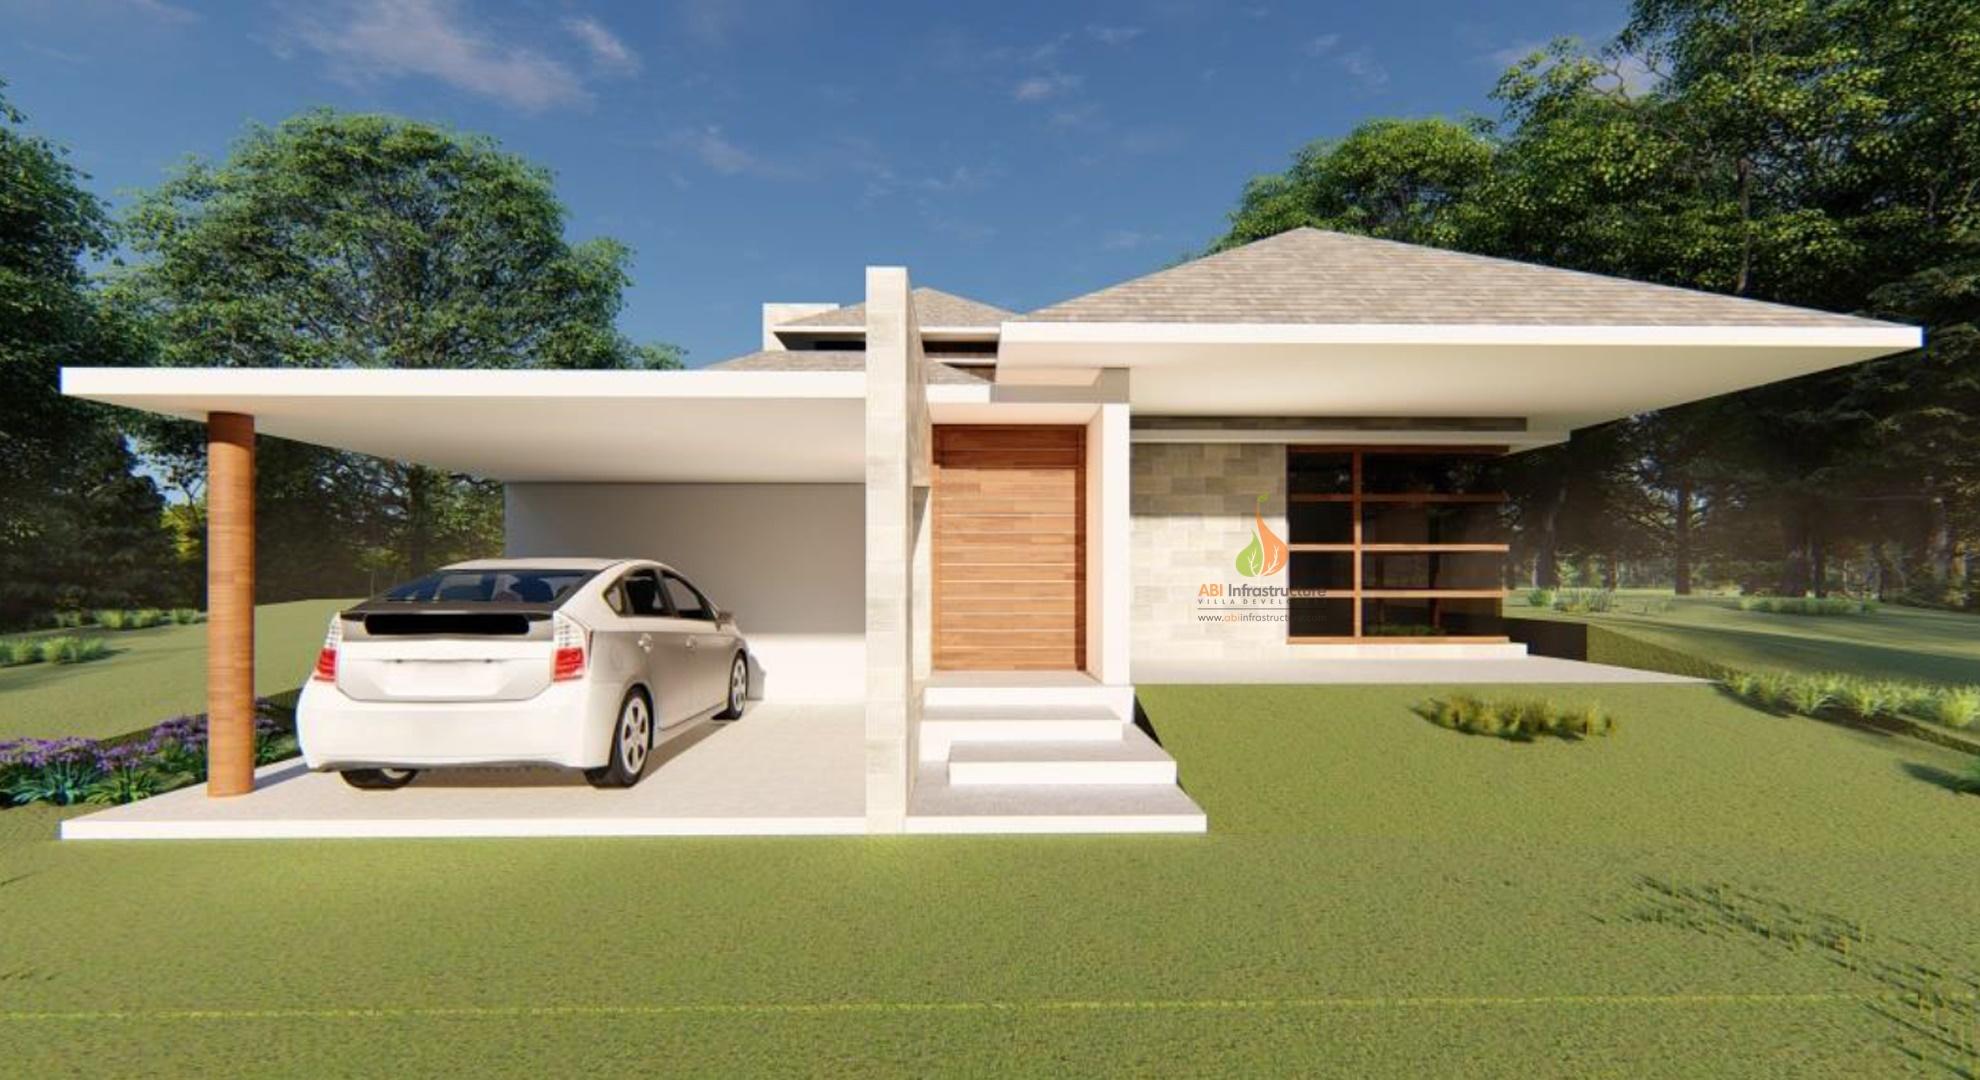 Villas for sale near Kattabettu